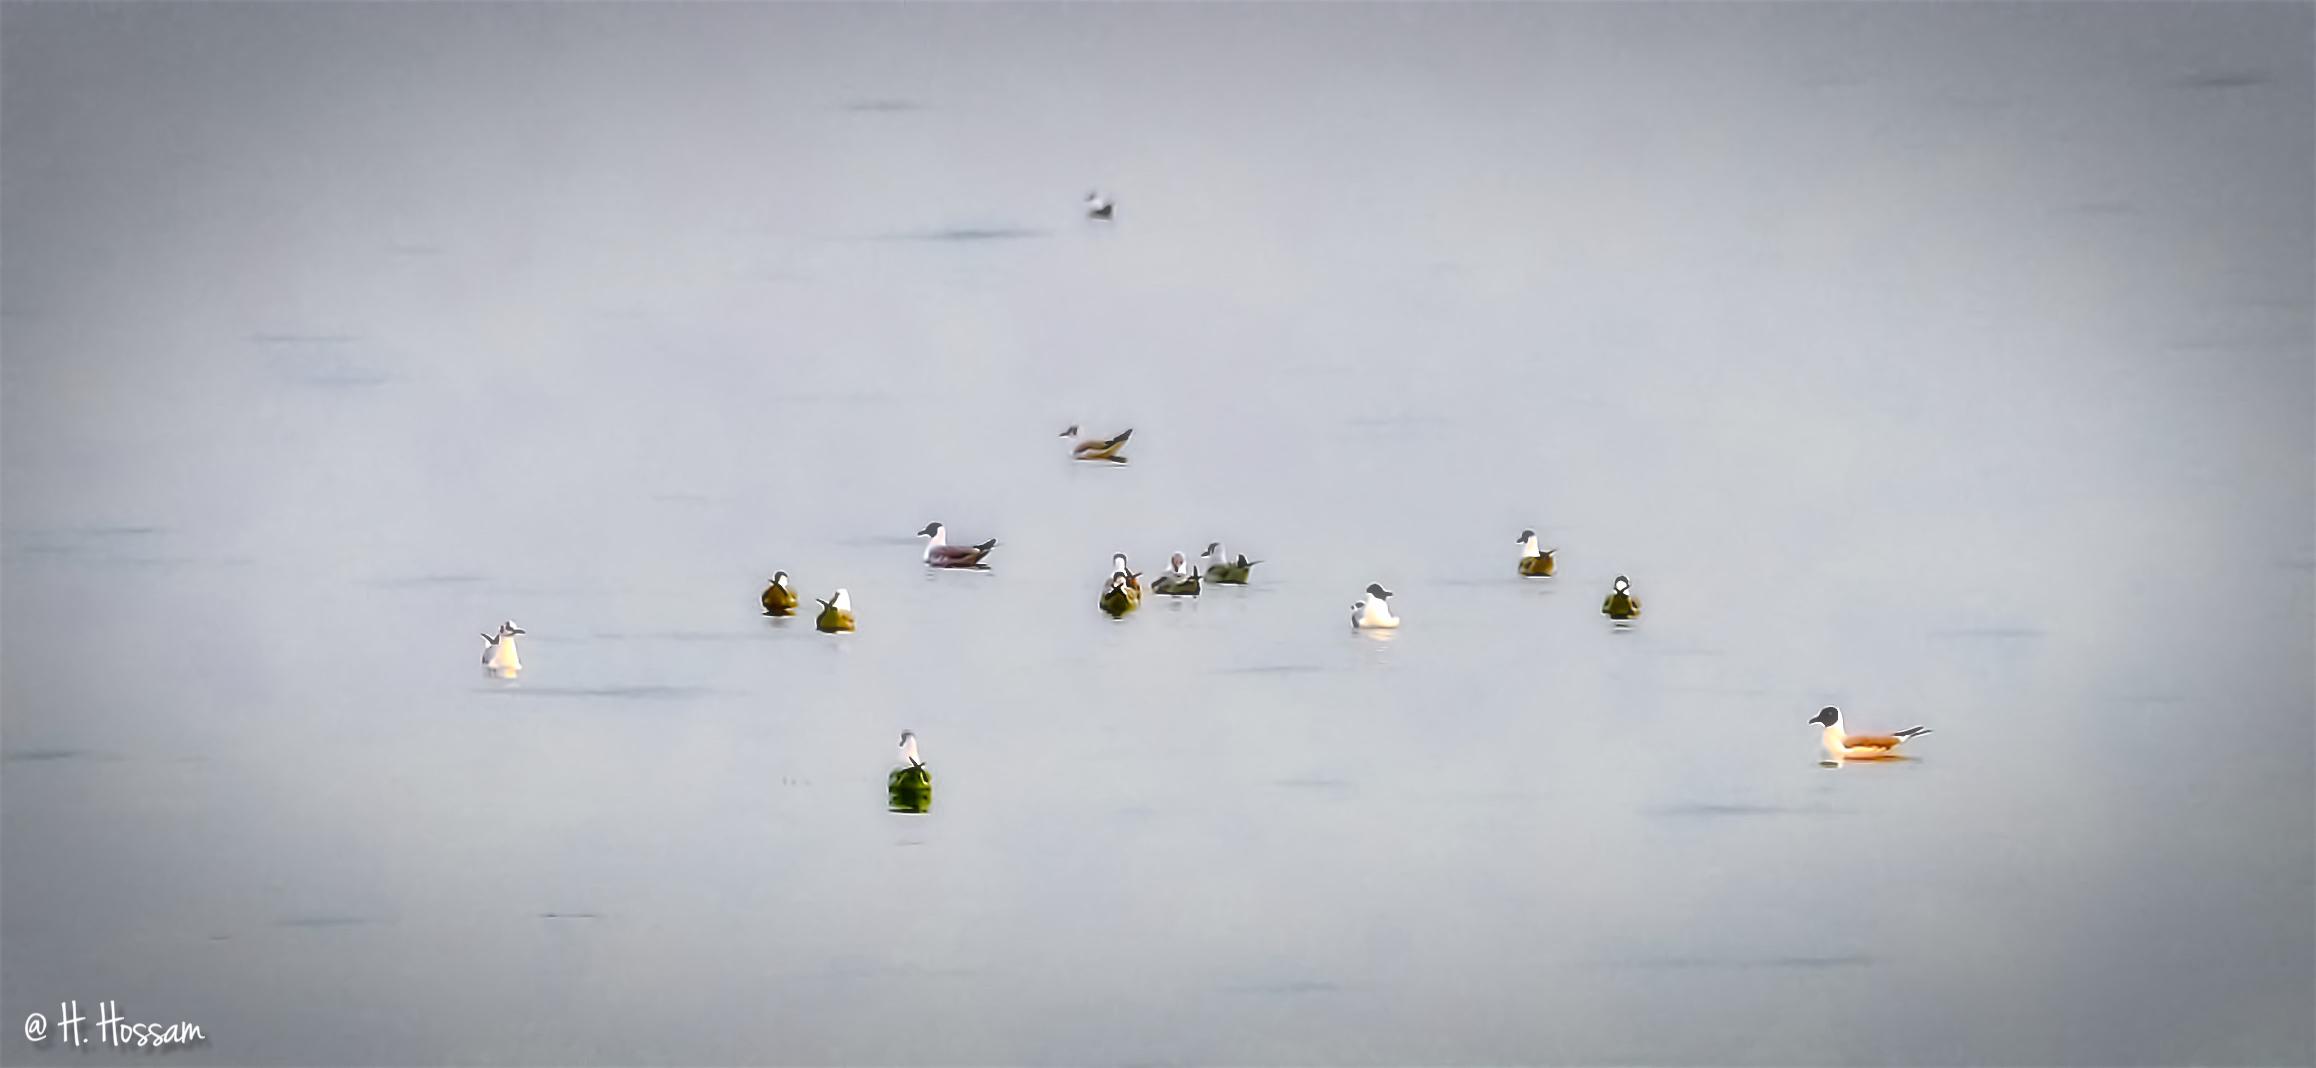 Seagulls' Dream